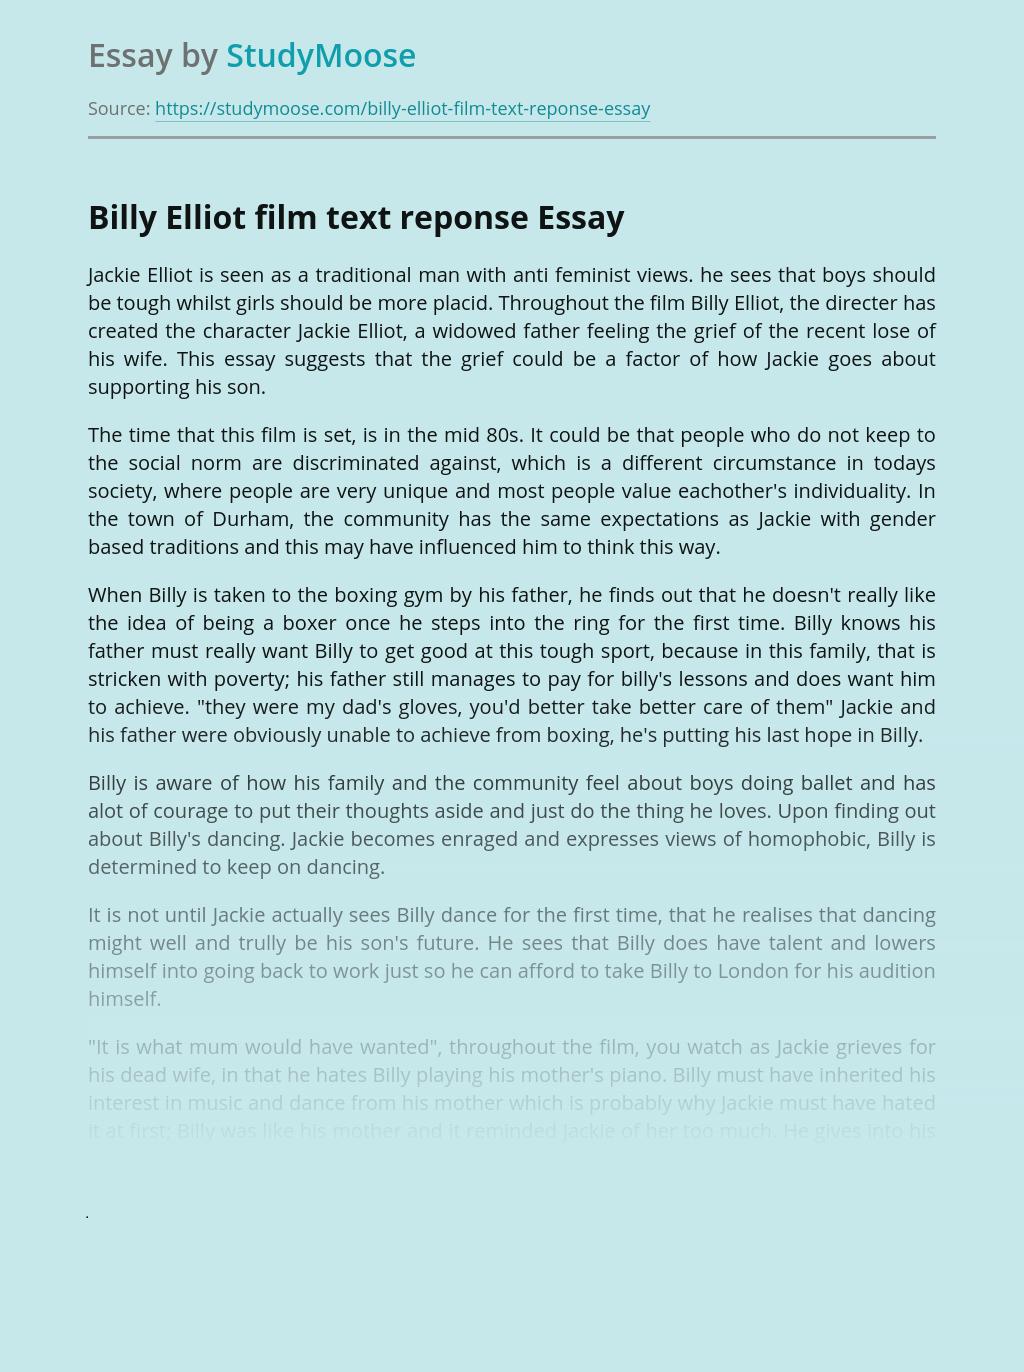 Billy Elliot film text reponse